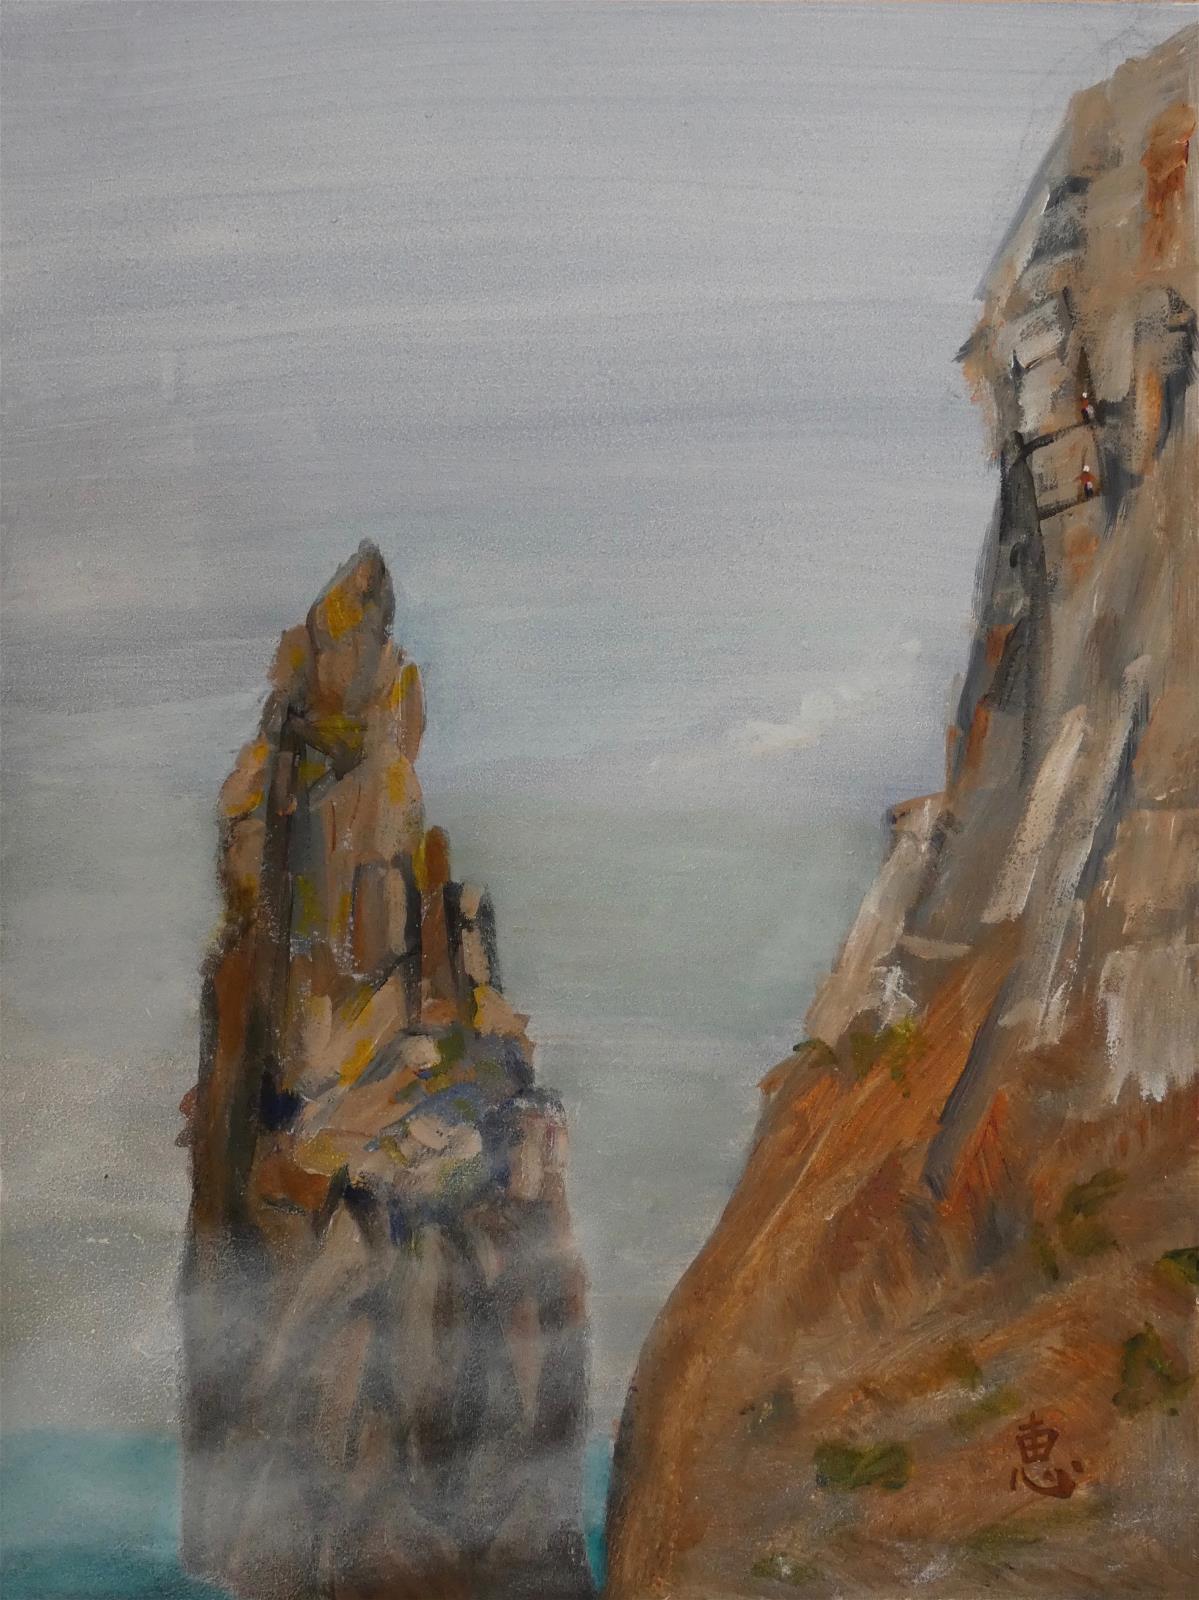 Climbers in the Mist, Bosigran